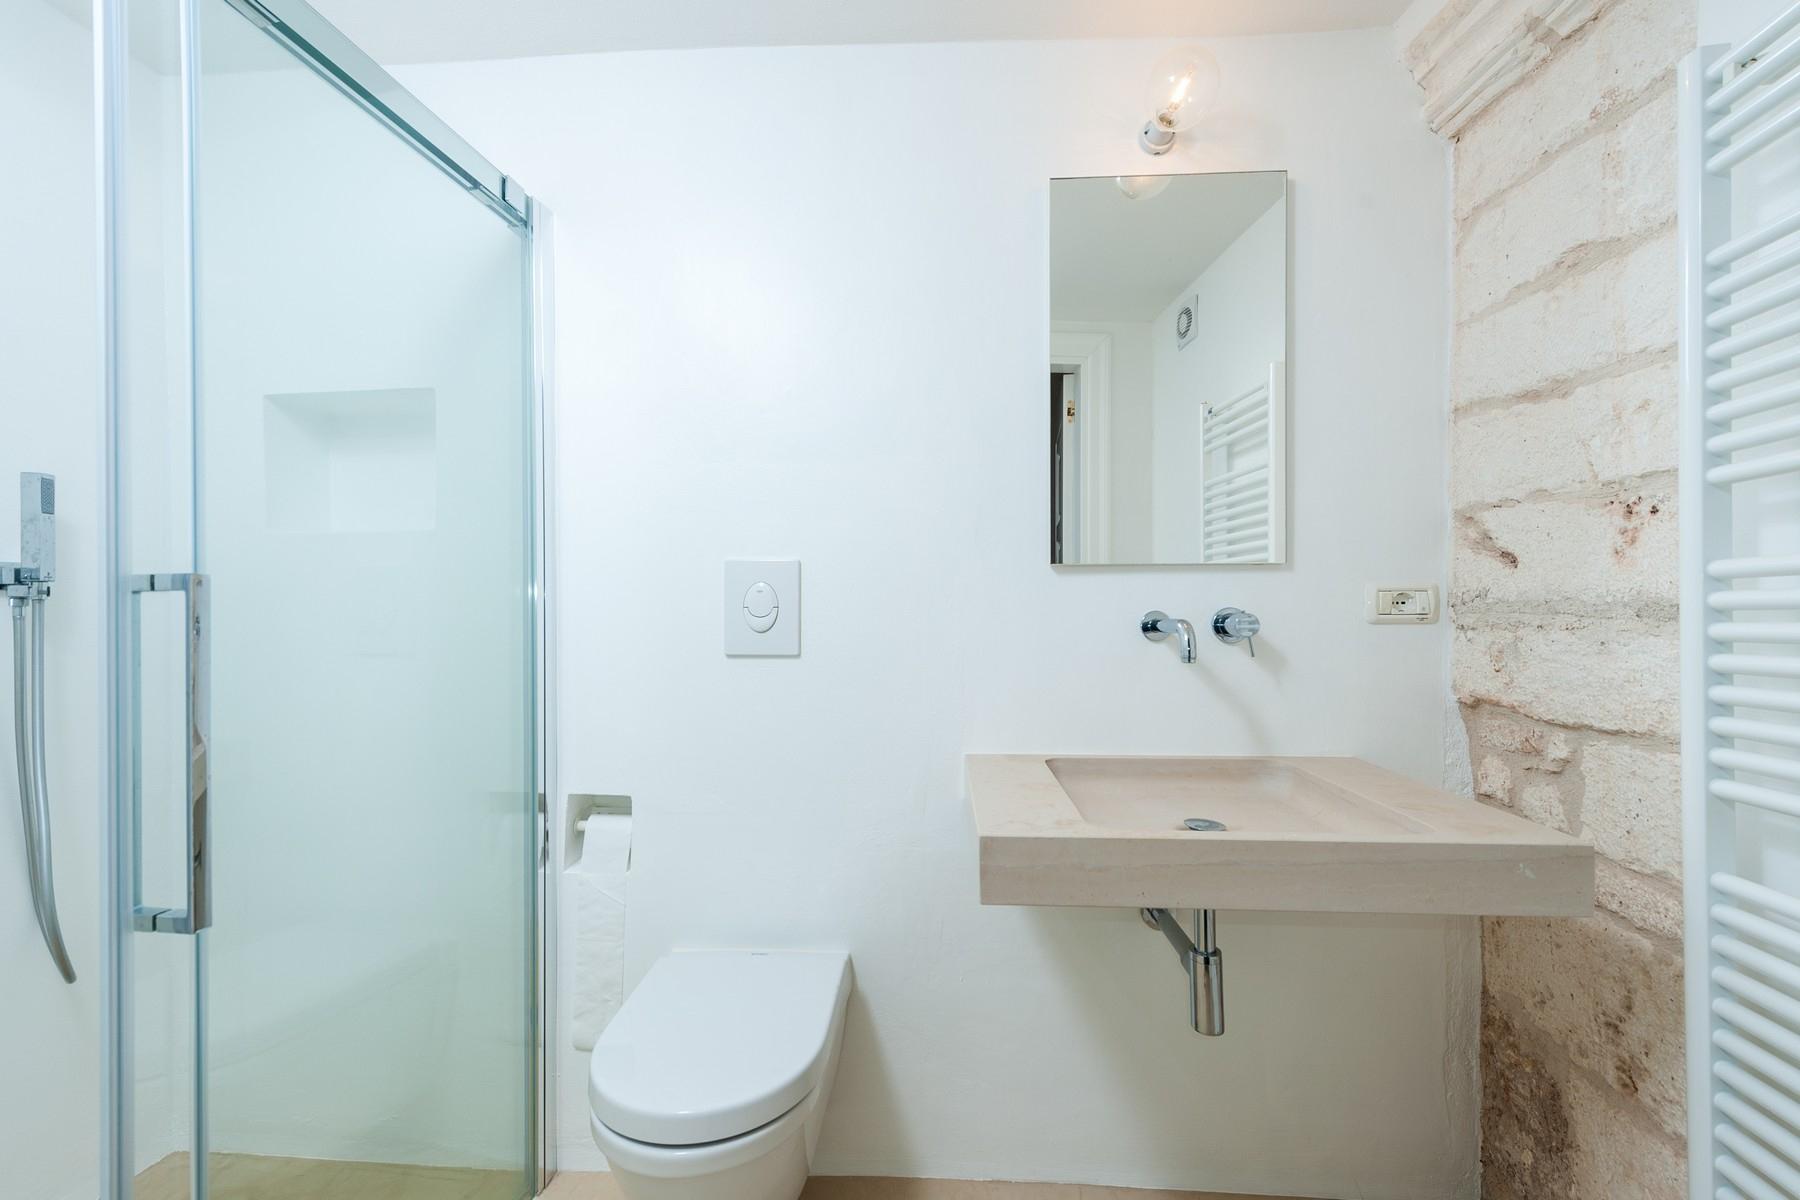 Appartamento in Vendita a Ostuni: 5 locali, 265 mq - Foto 25